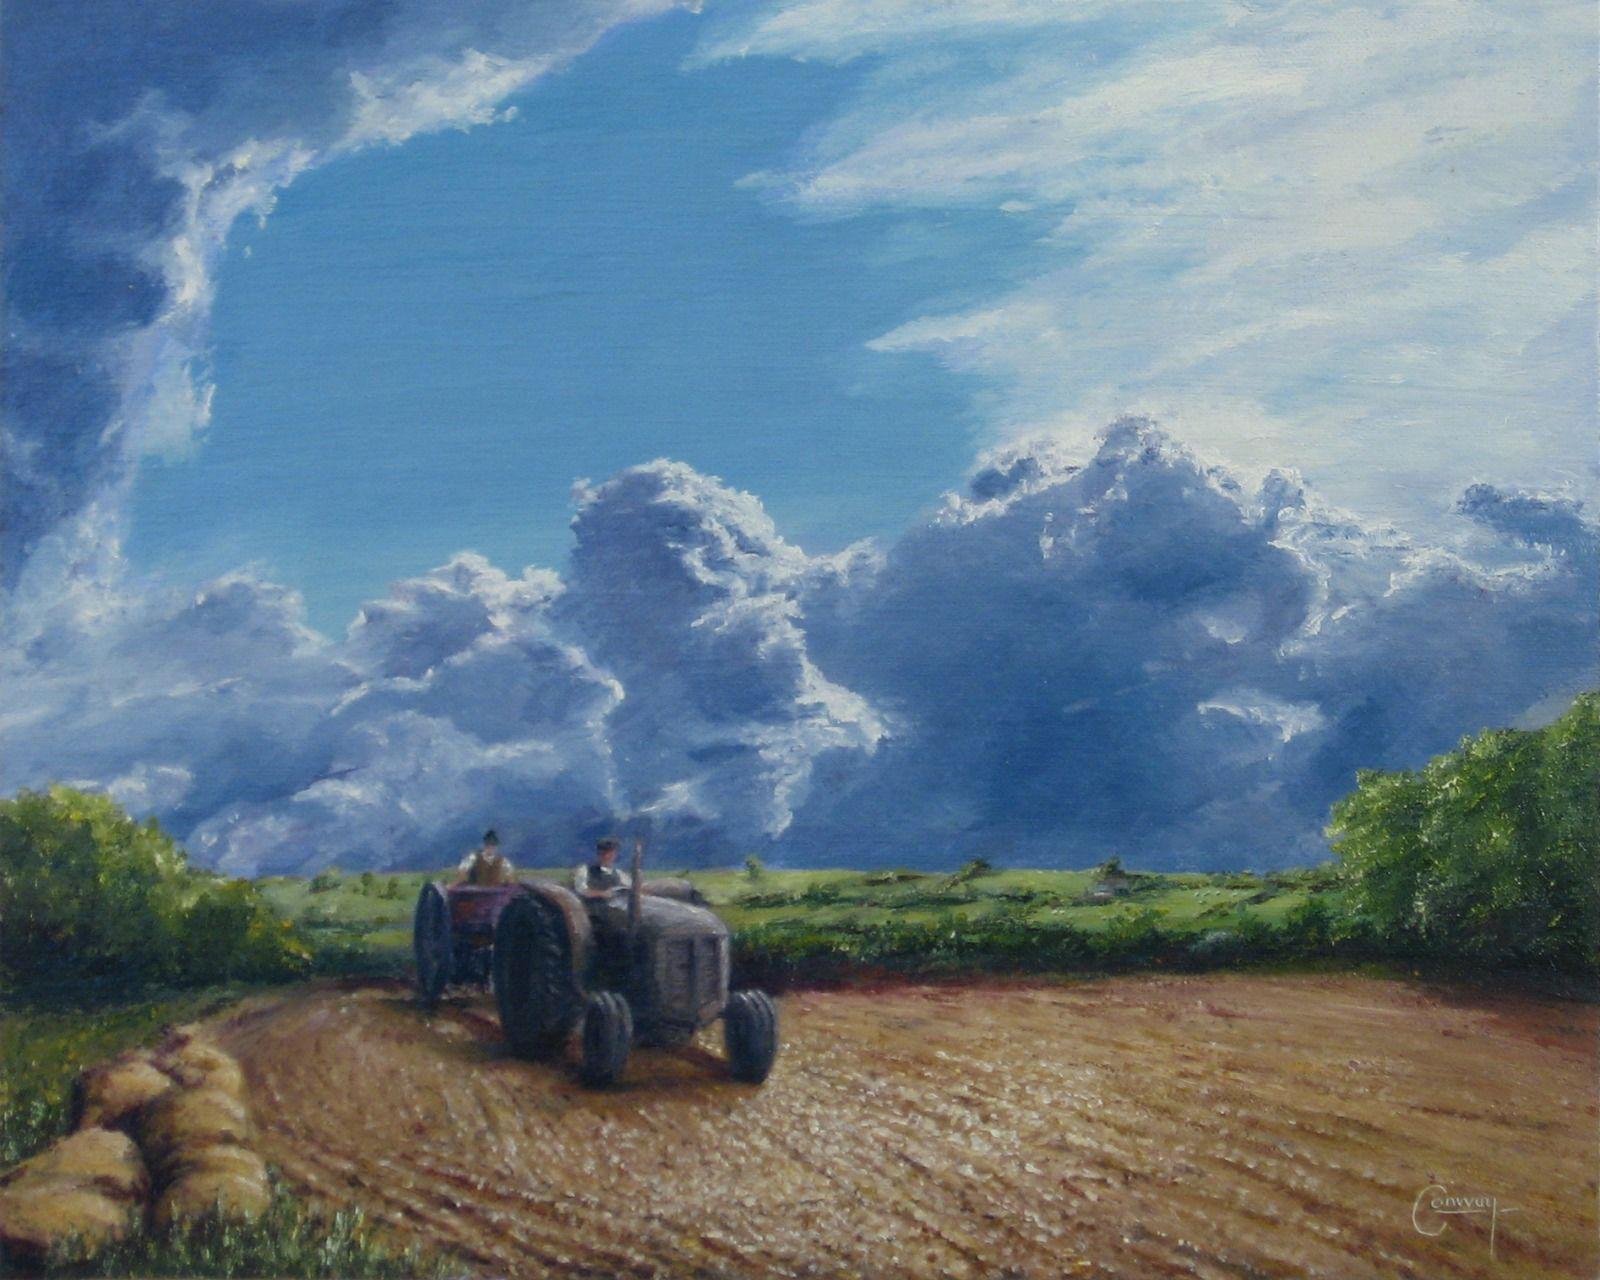 Drilling corn with Ferguson TE20 tractor, near Llandeilo Carmarthenshire